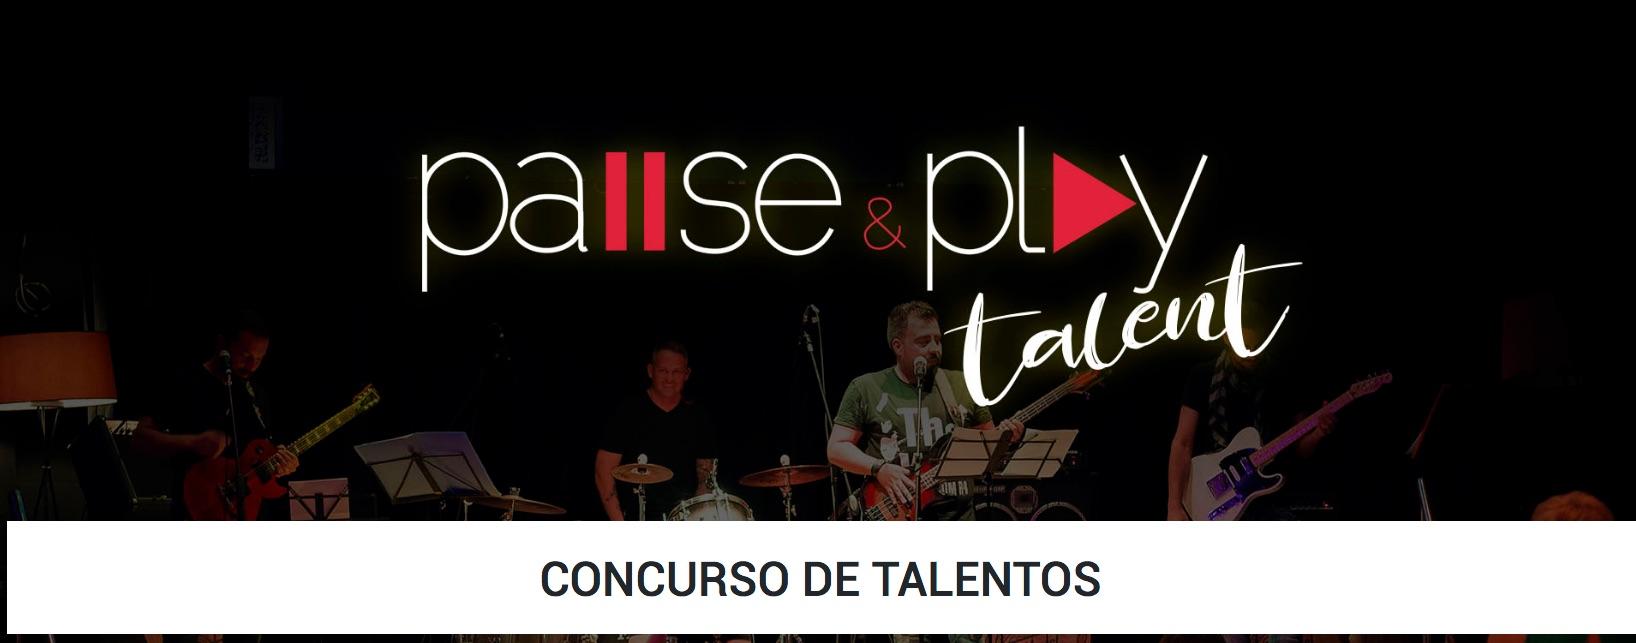 Pause Play talent Sambil